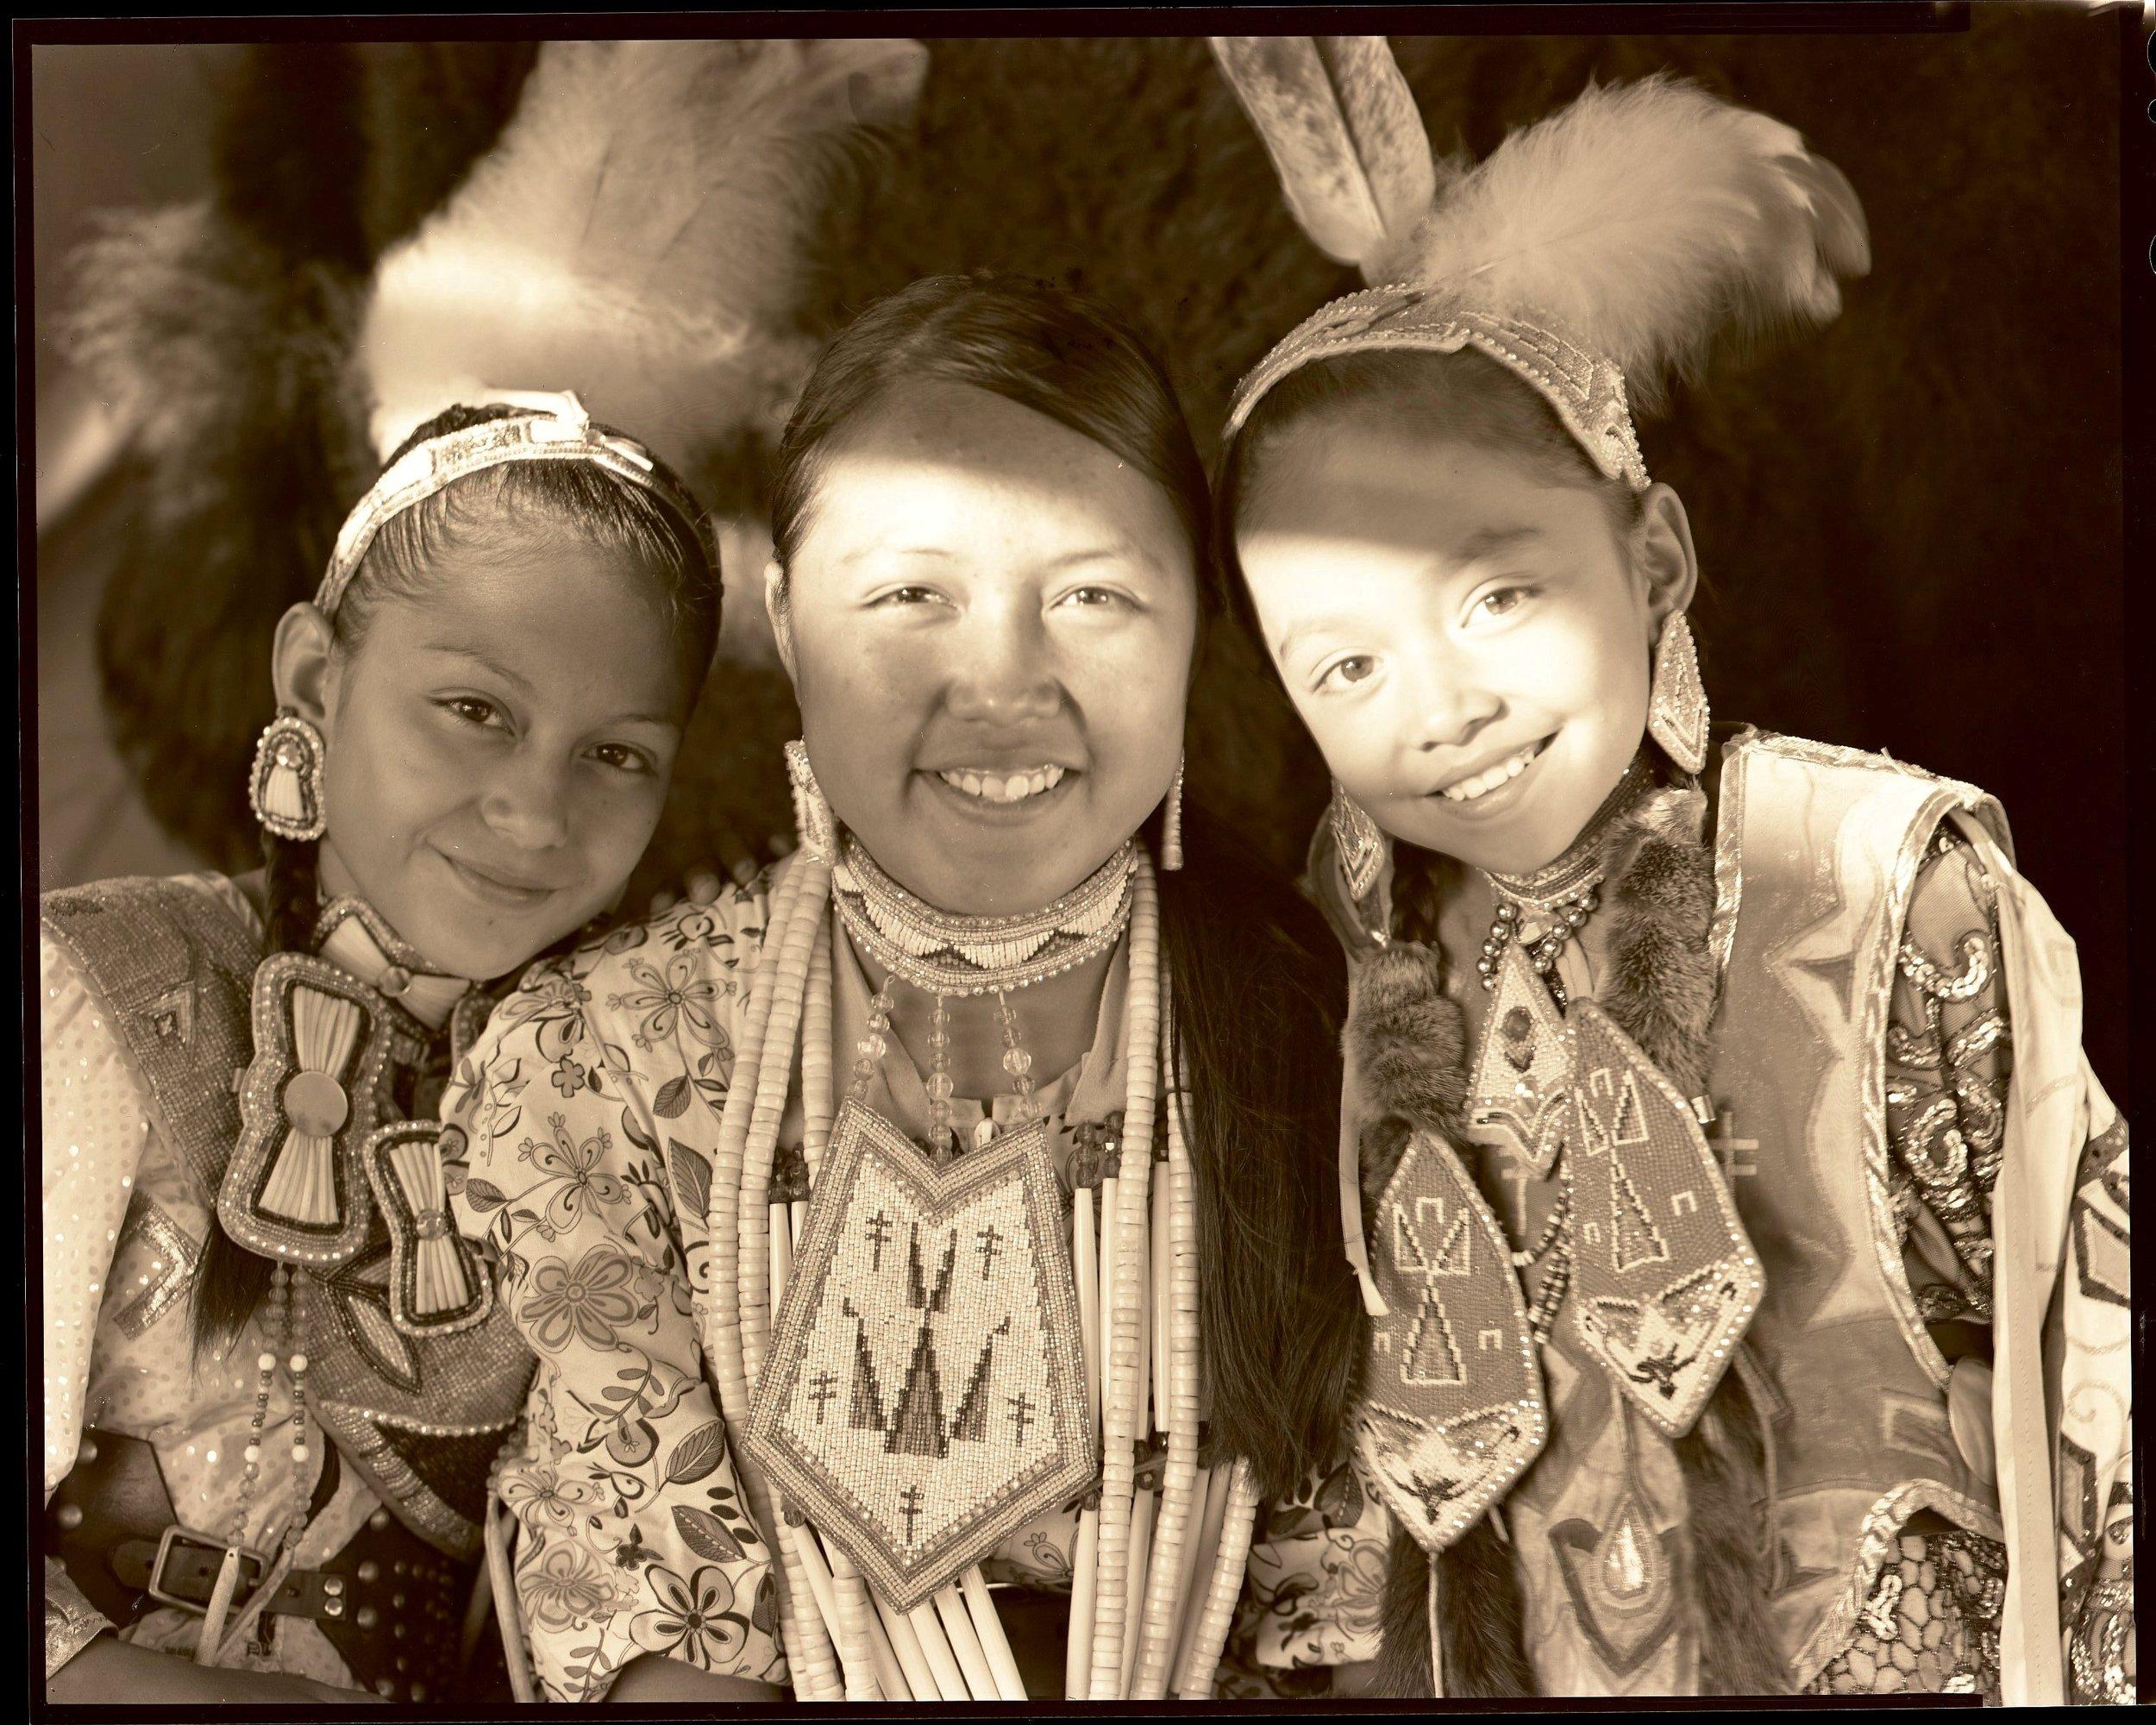 15 Camille Magpie, Kelley Sweetwater, Grace She Blushes Ponyah Lakota, Hopi, Dine (1).jpg